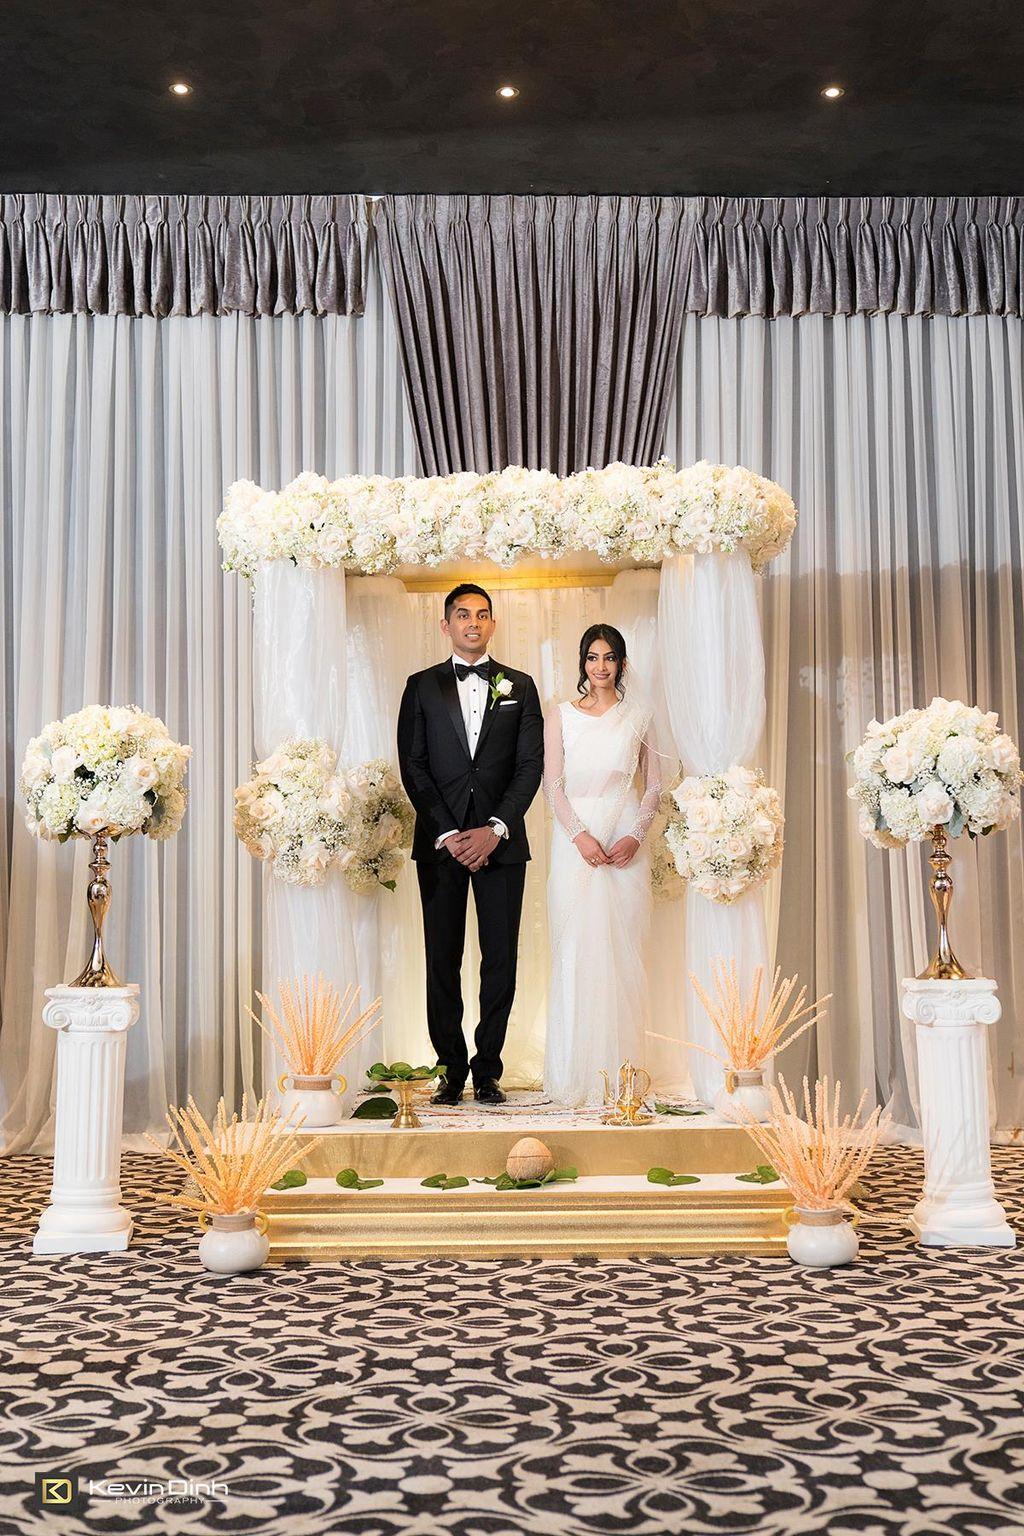 Melissa and Lucky's Wedding